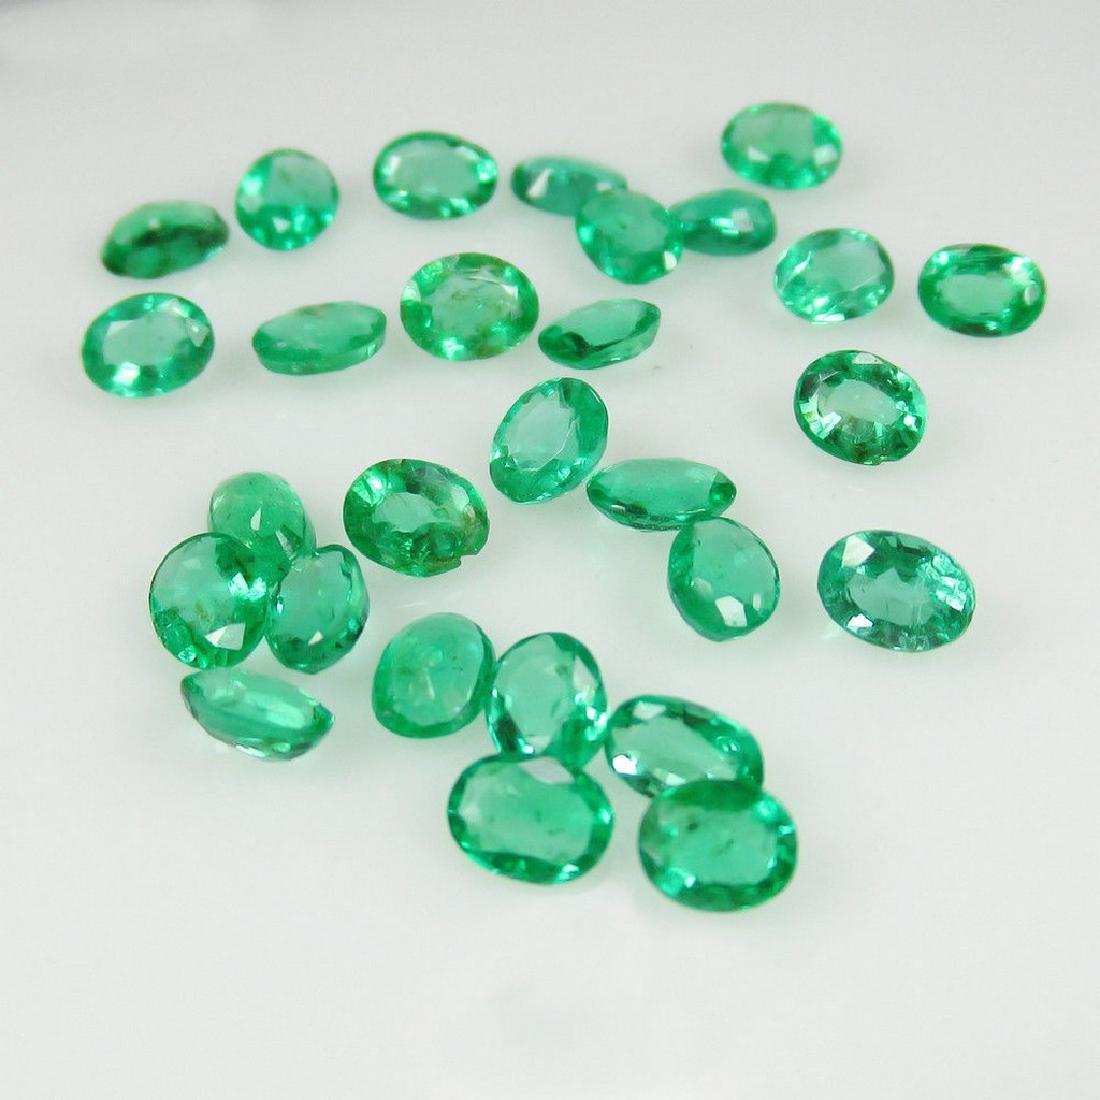 3.96 Ctw Natural 28 Loose Zambian Emerald Oval Cut Lot